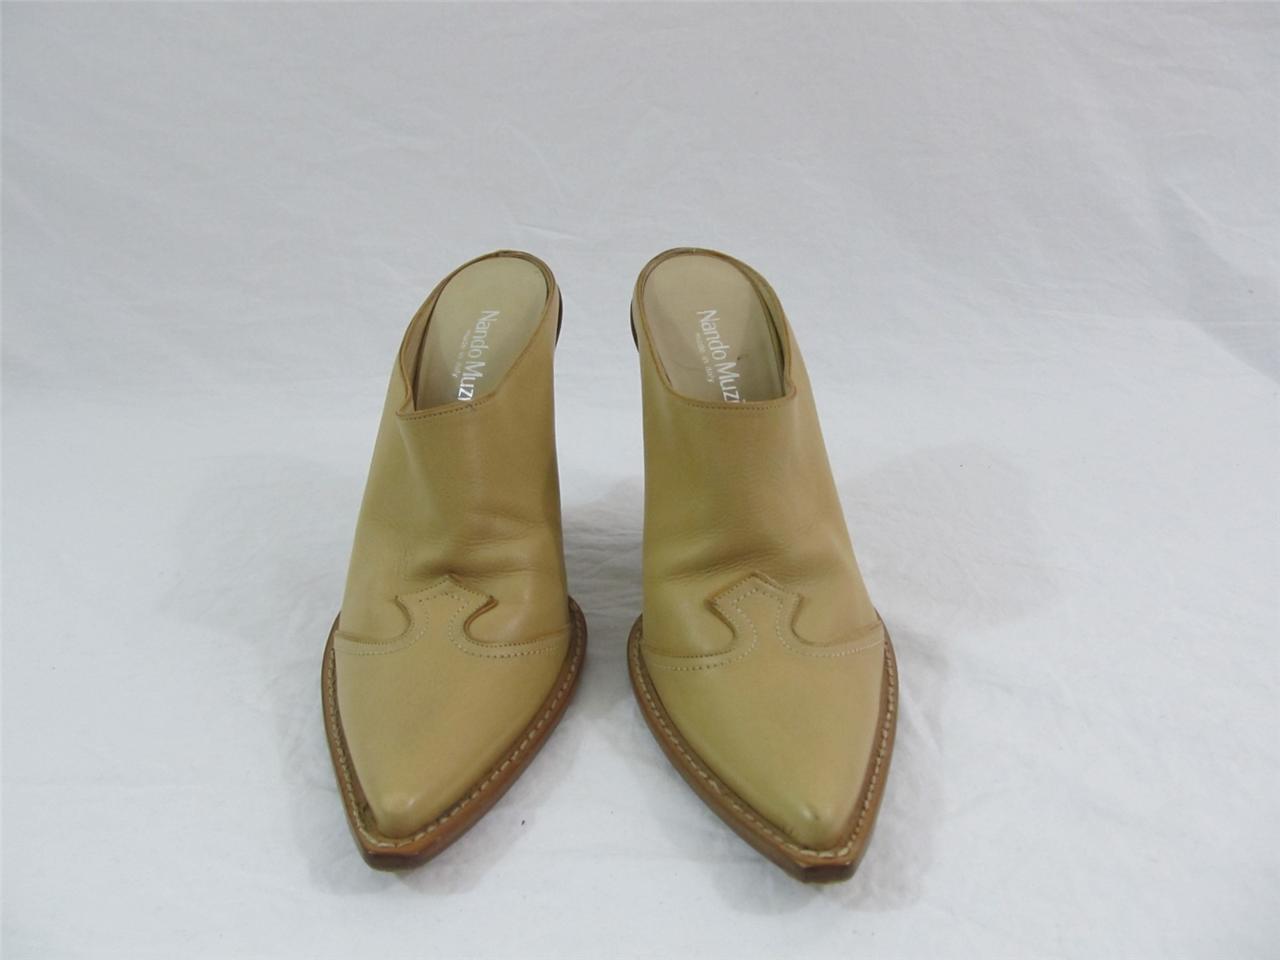 Nando Muzi Women's Back Open Back Women's Boots Heels Shoes Size 8 US, 38 EURO Retail $700 97e951